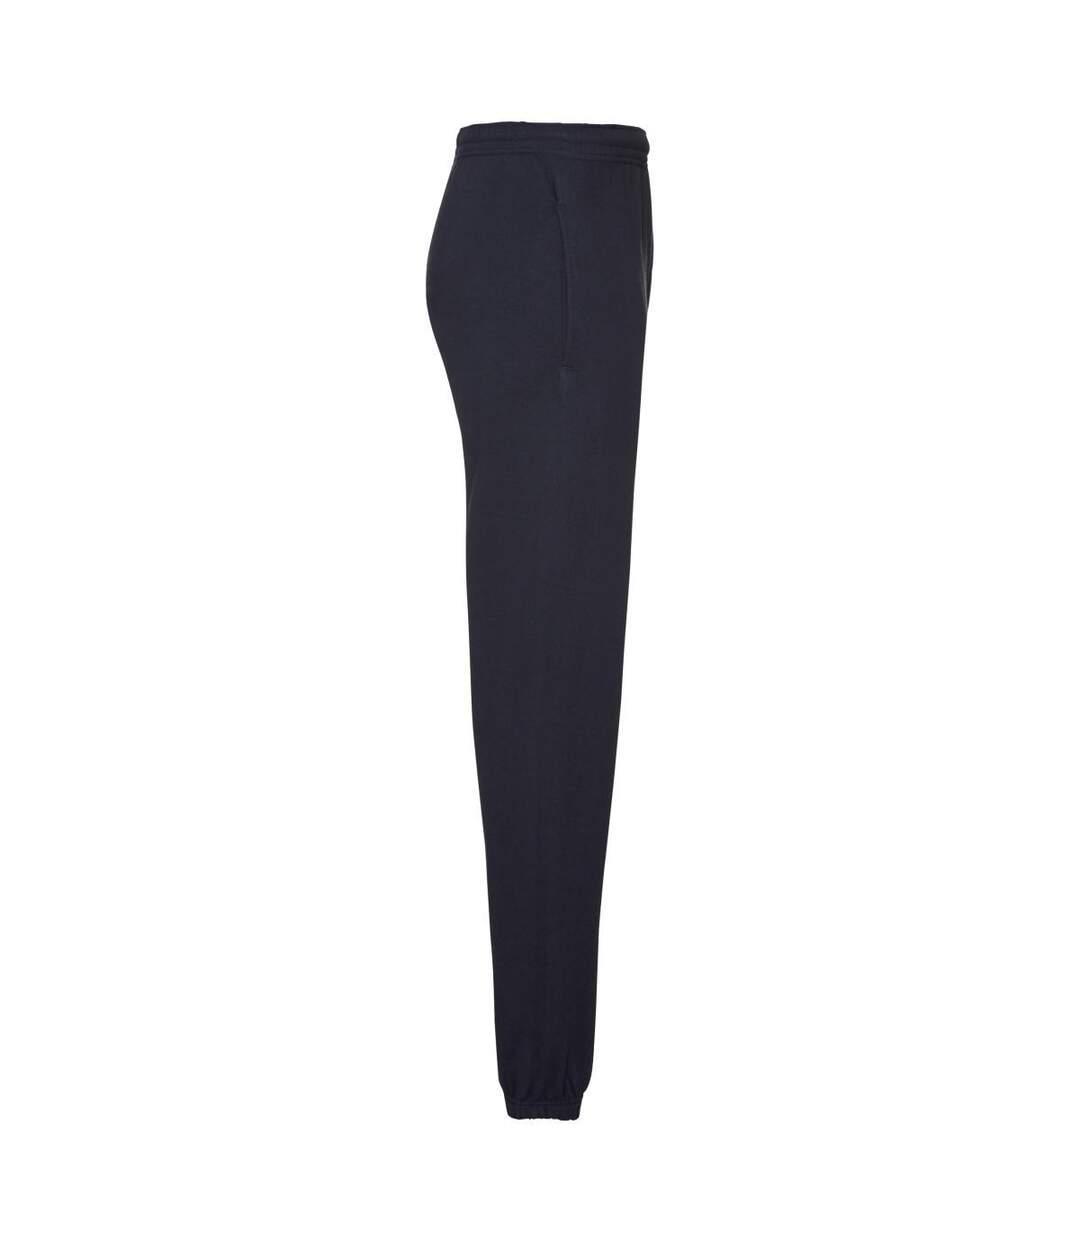 Fruit of the Loom Mens Classic Elasticated Jogging Bottoms (Deep Navy) - UTBC4816